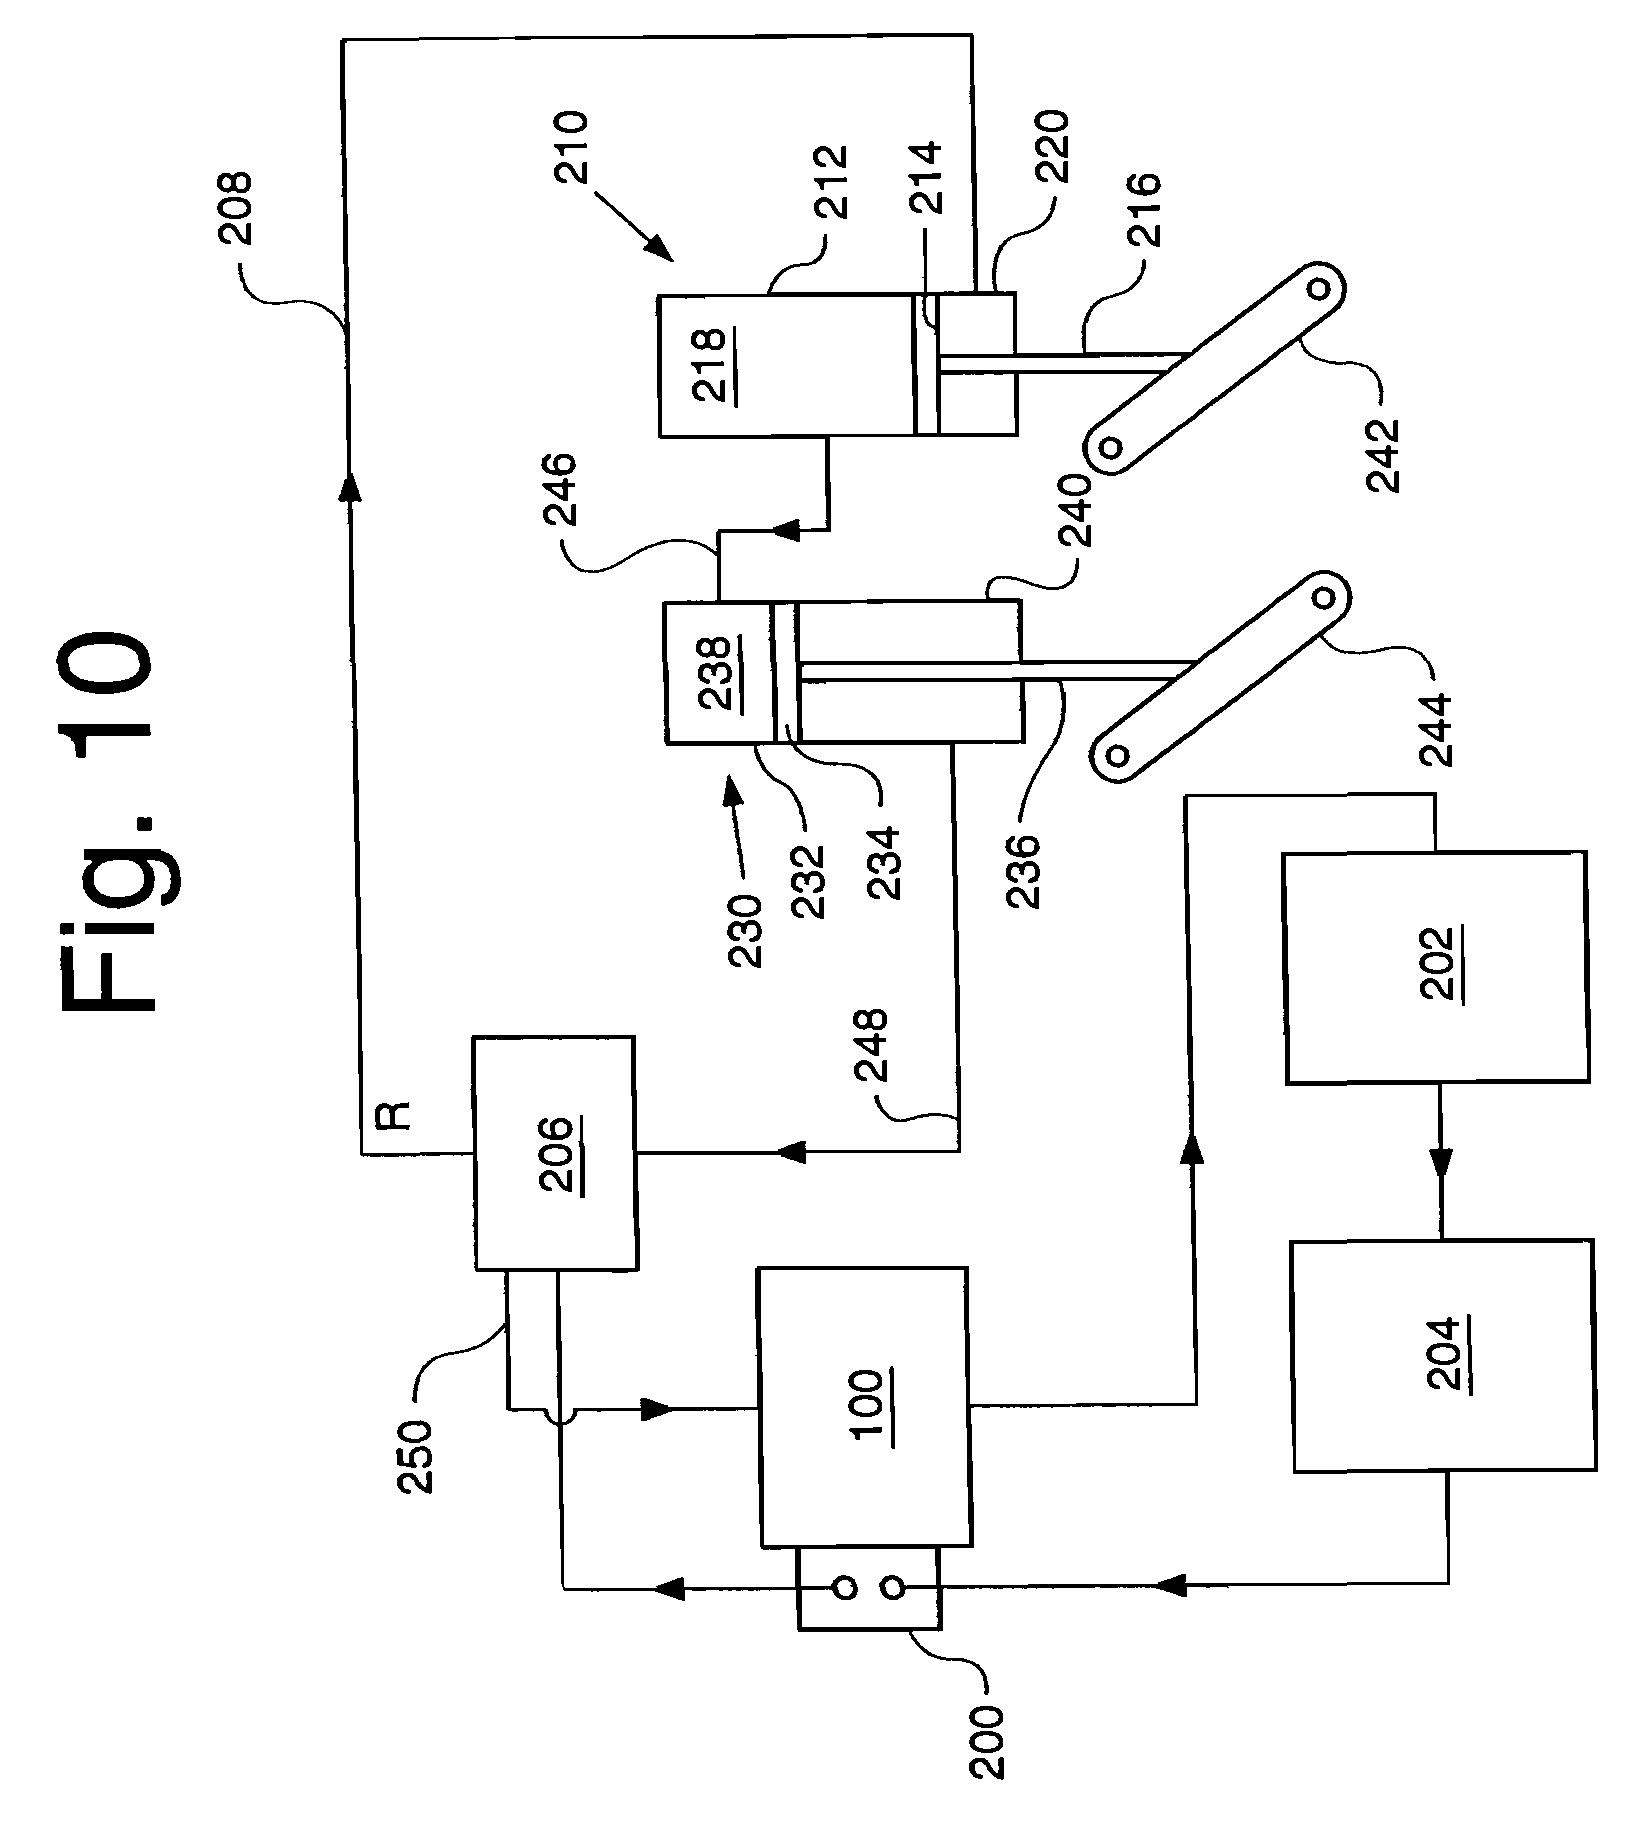 Roketa Atv Wiring Diagram 12 Diagram Auto Wiring Diagram